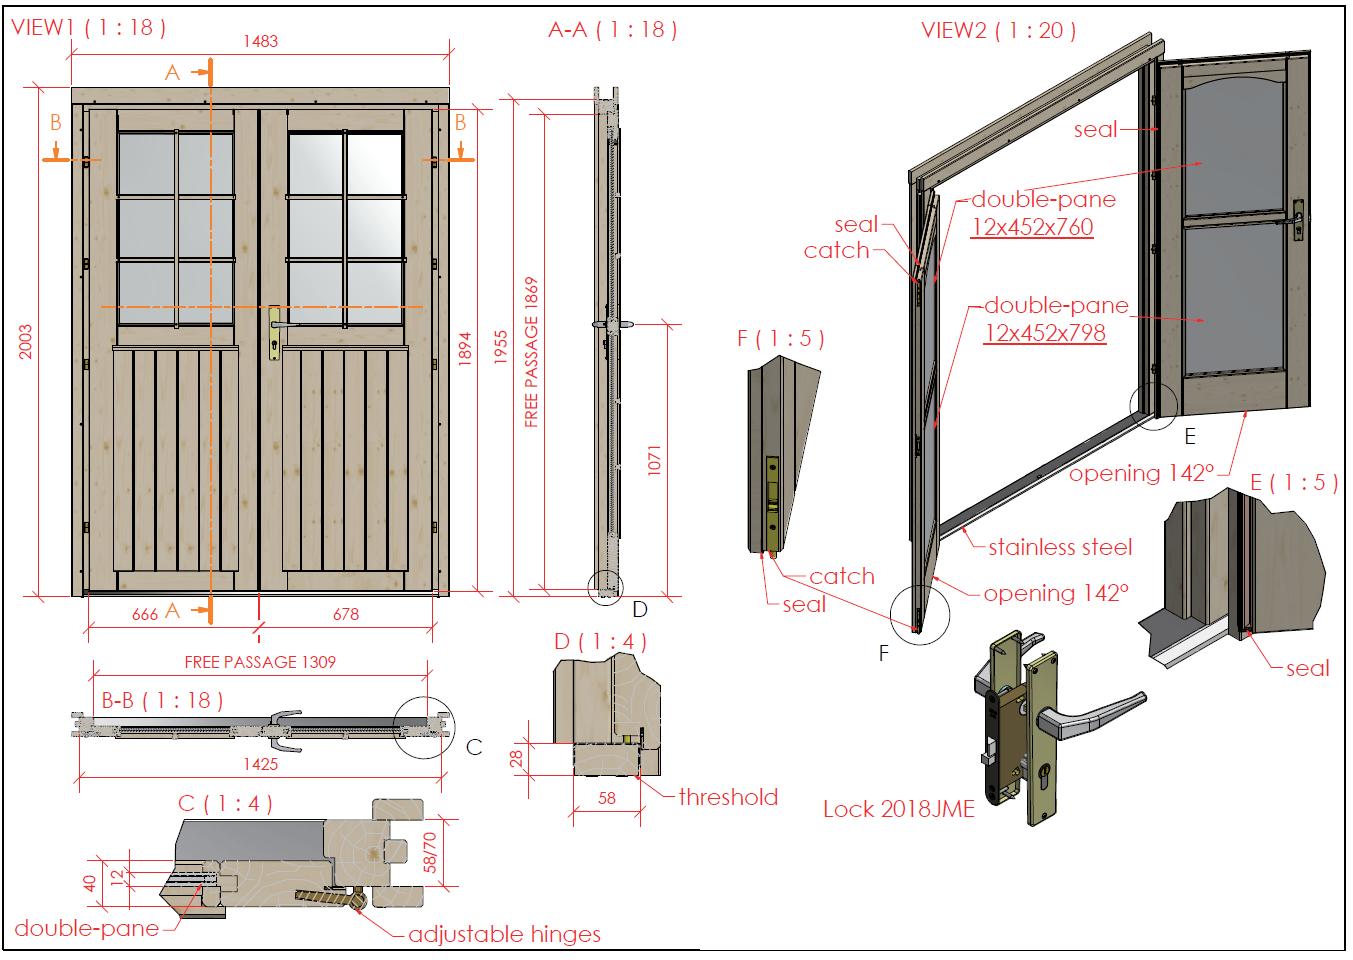 gartenhaus doppelt r iso glas gerade 1 2 verglast 1 425. Black Bedroom Furniture Sets. Home Design Ideas